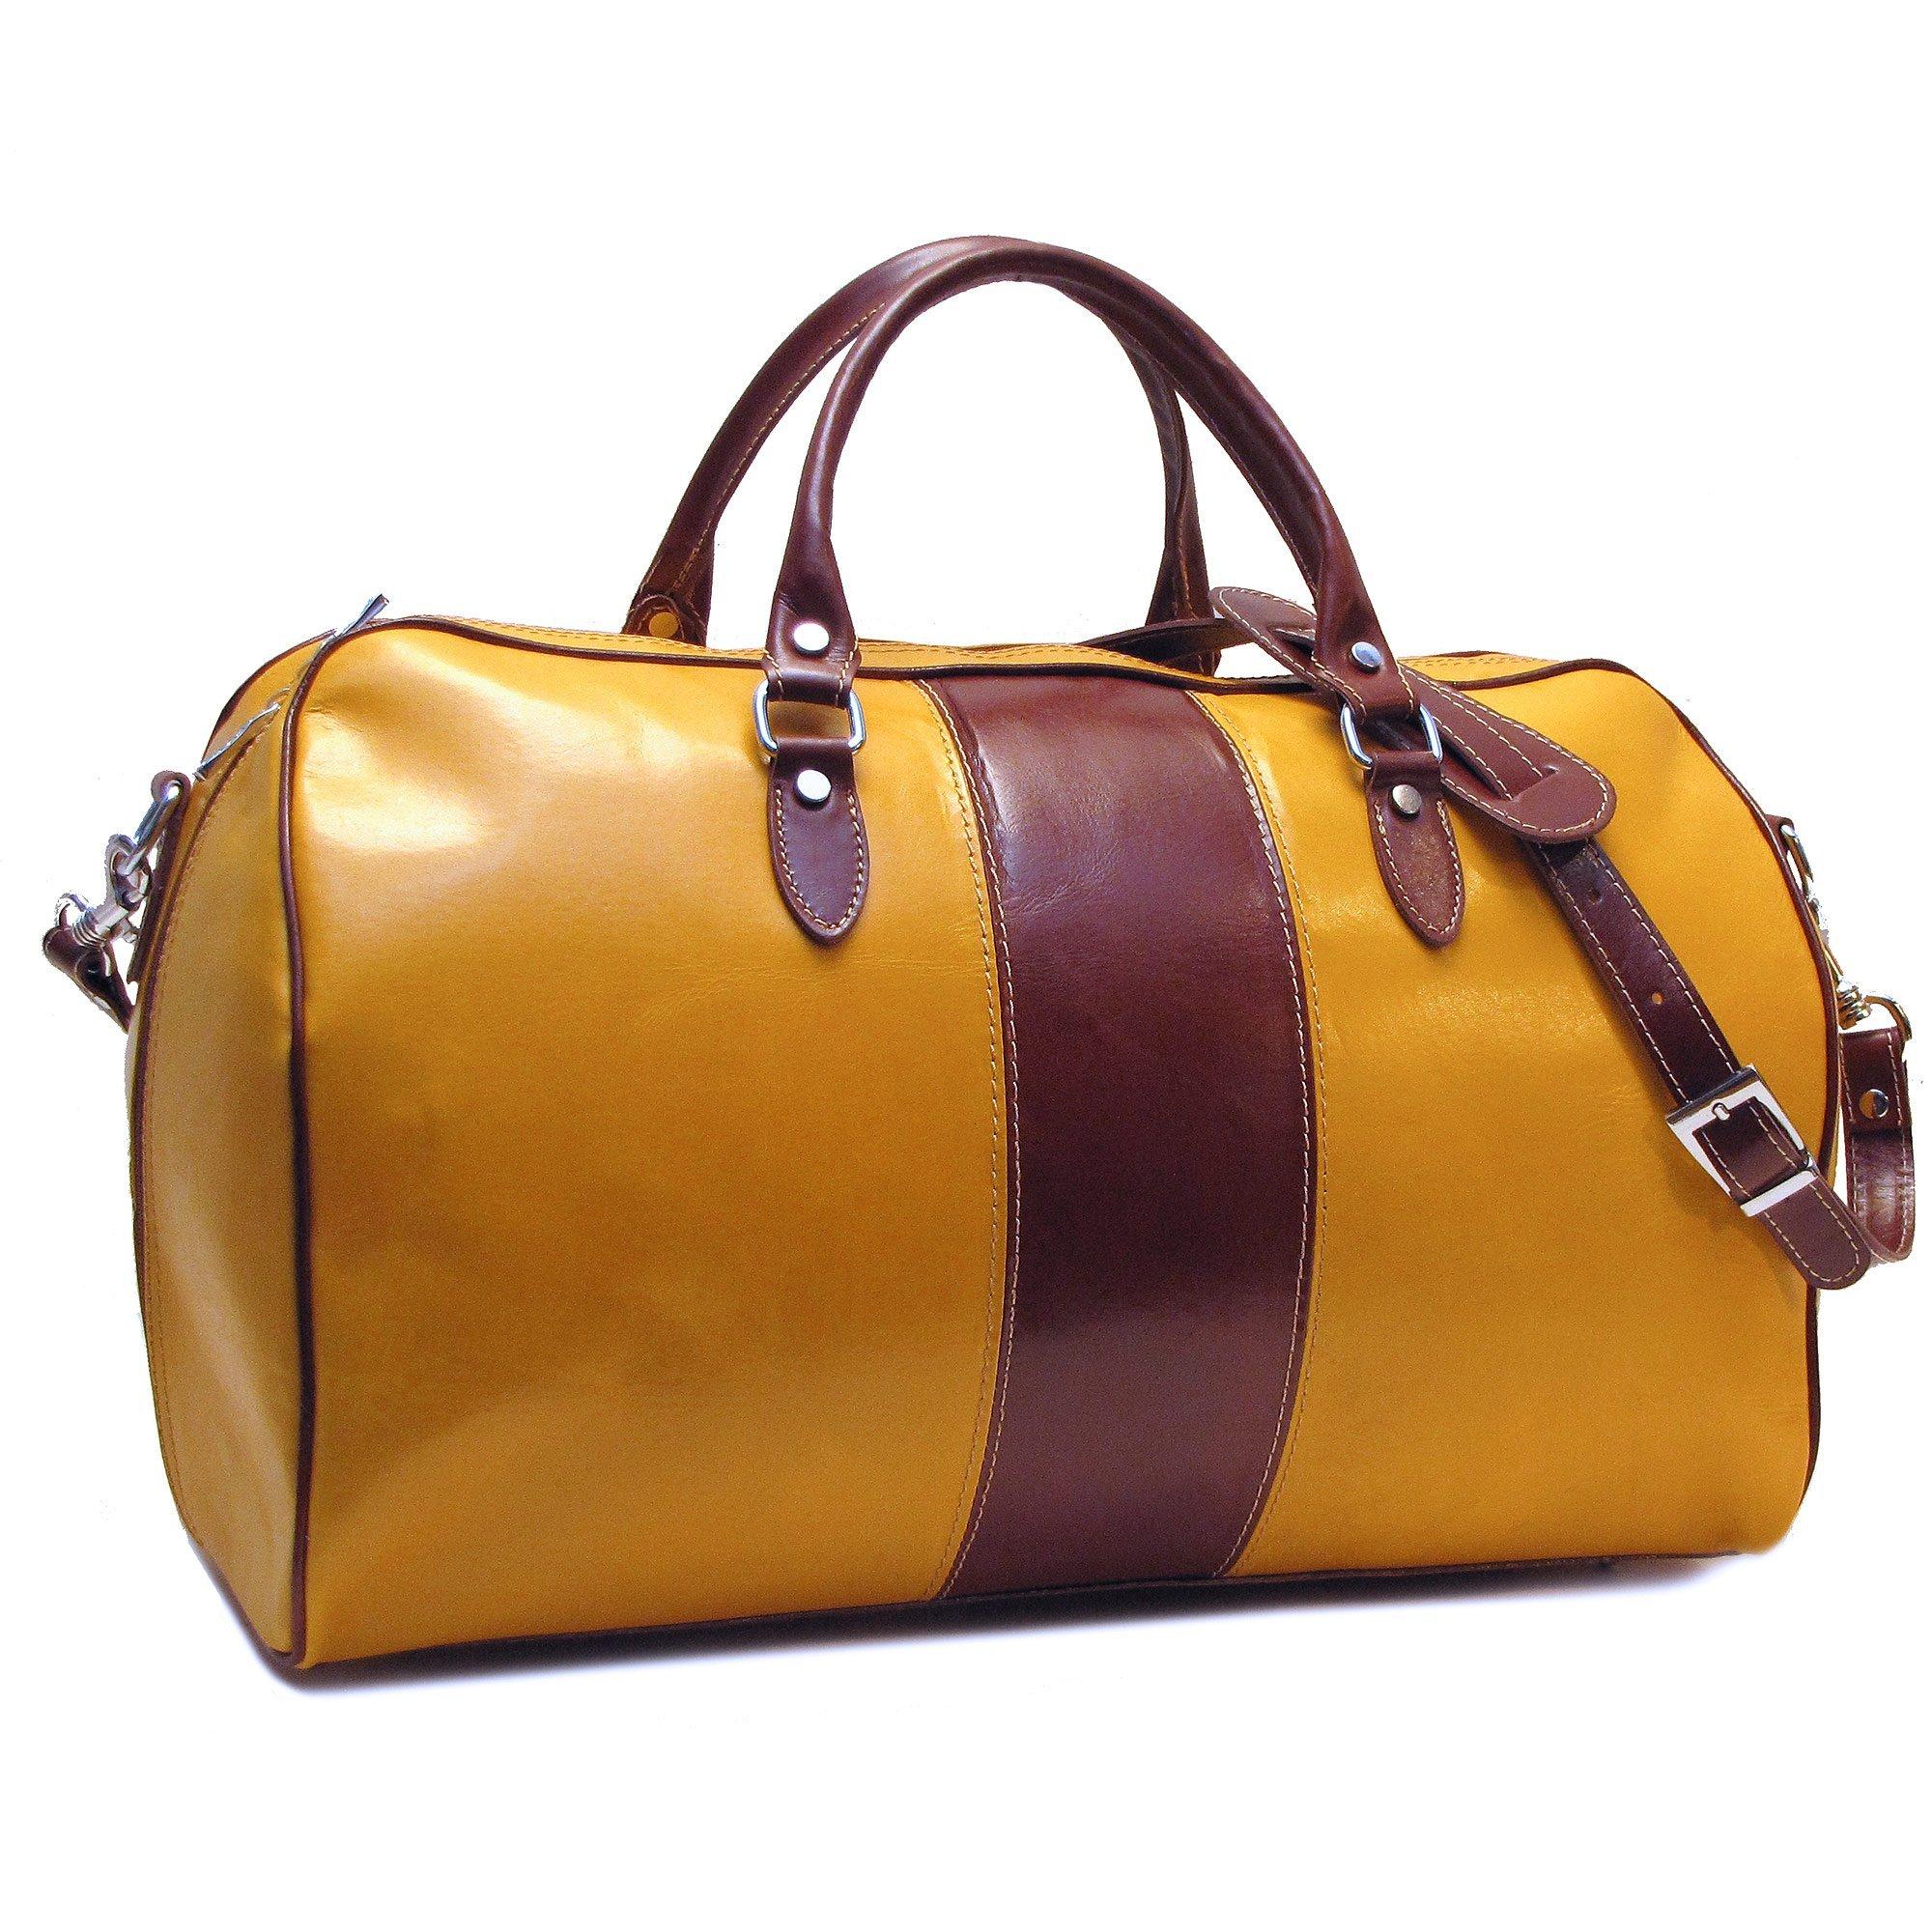 Floto Venezia Duffle Bag in Yellow and Brown Italian Calfskin Leather